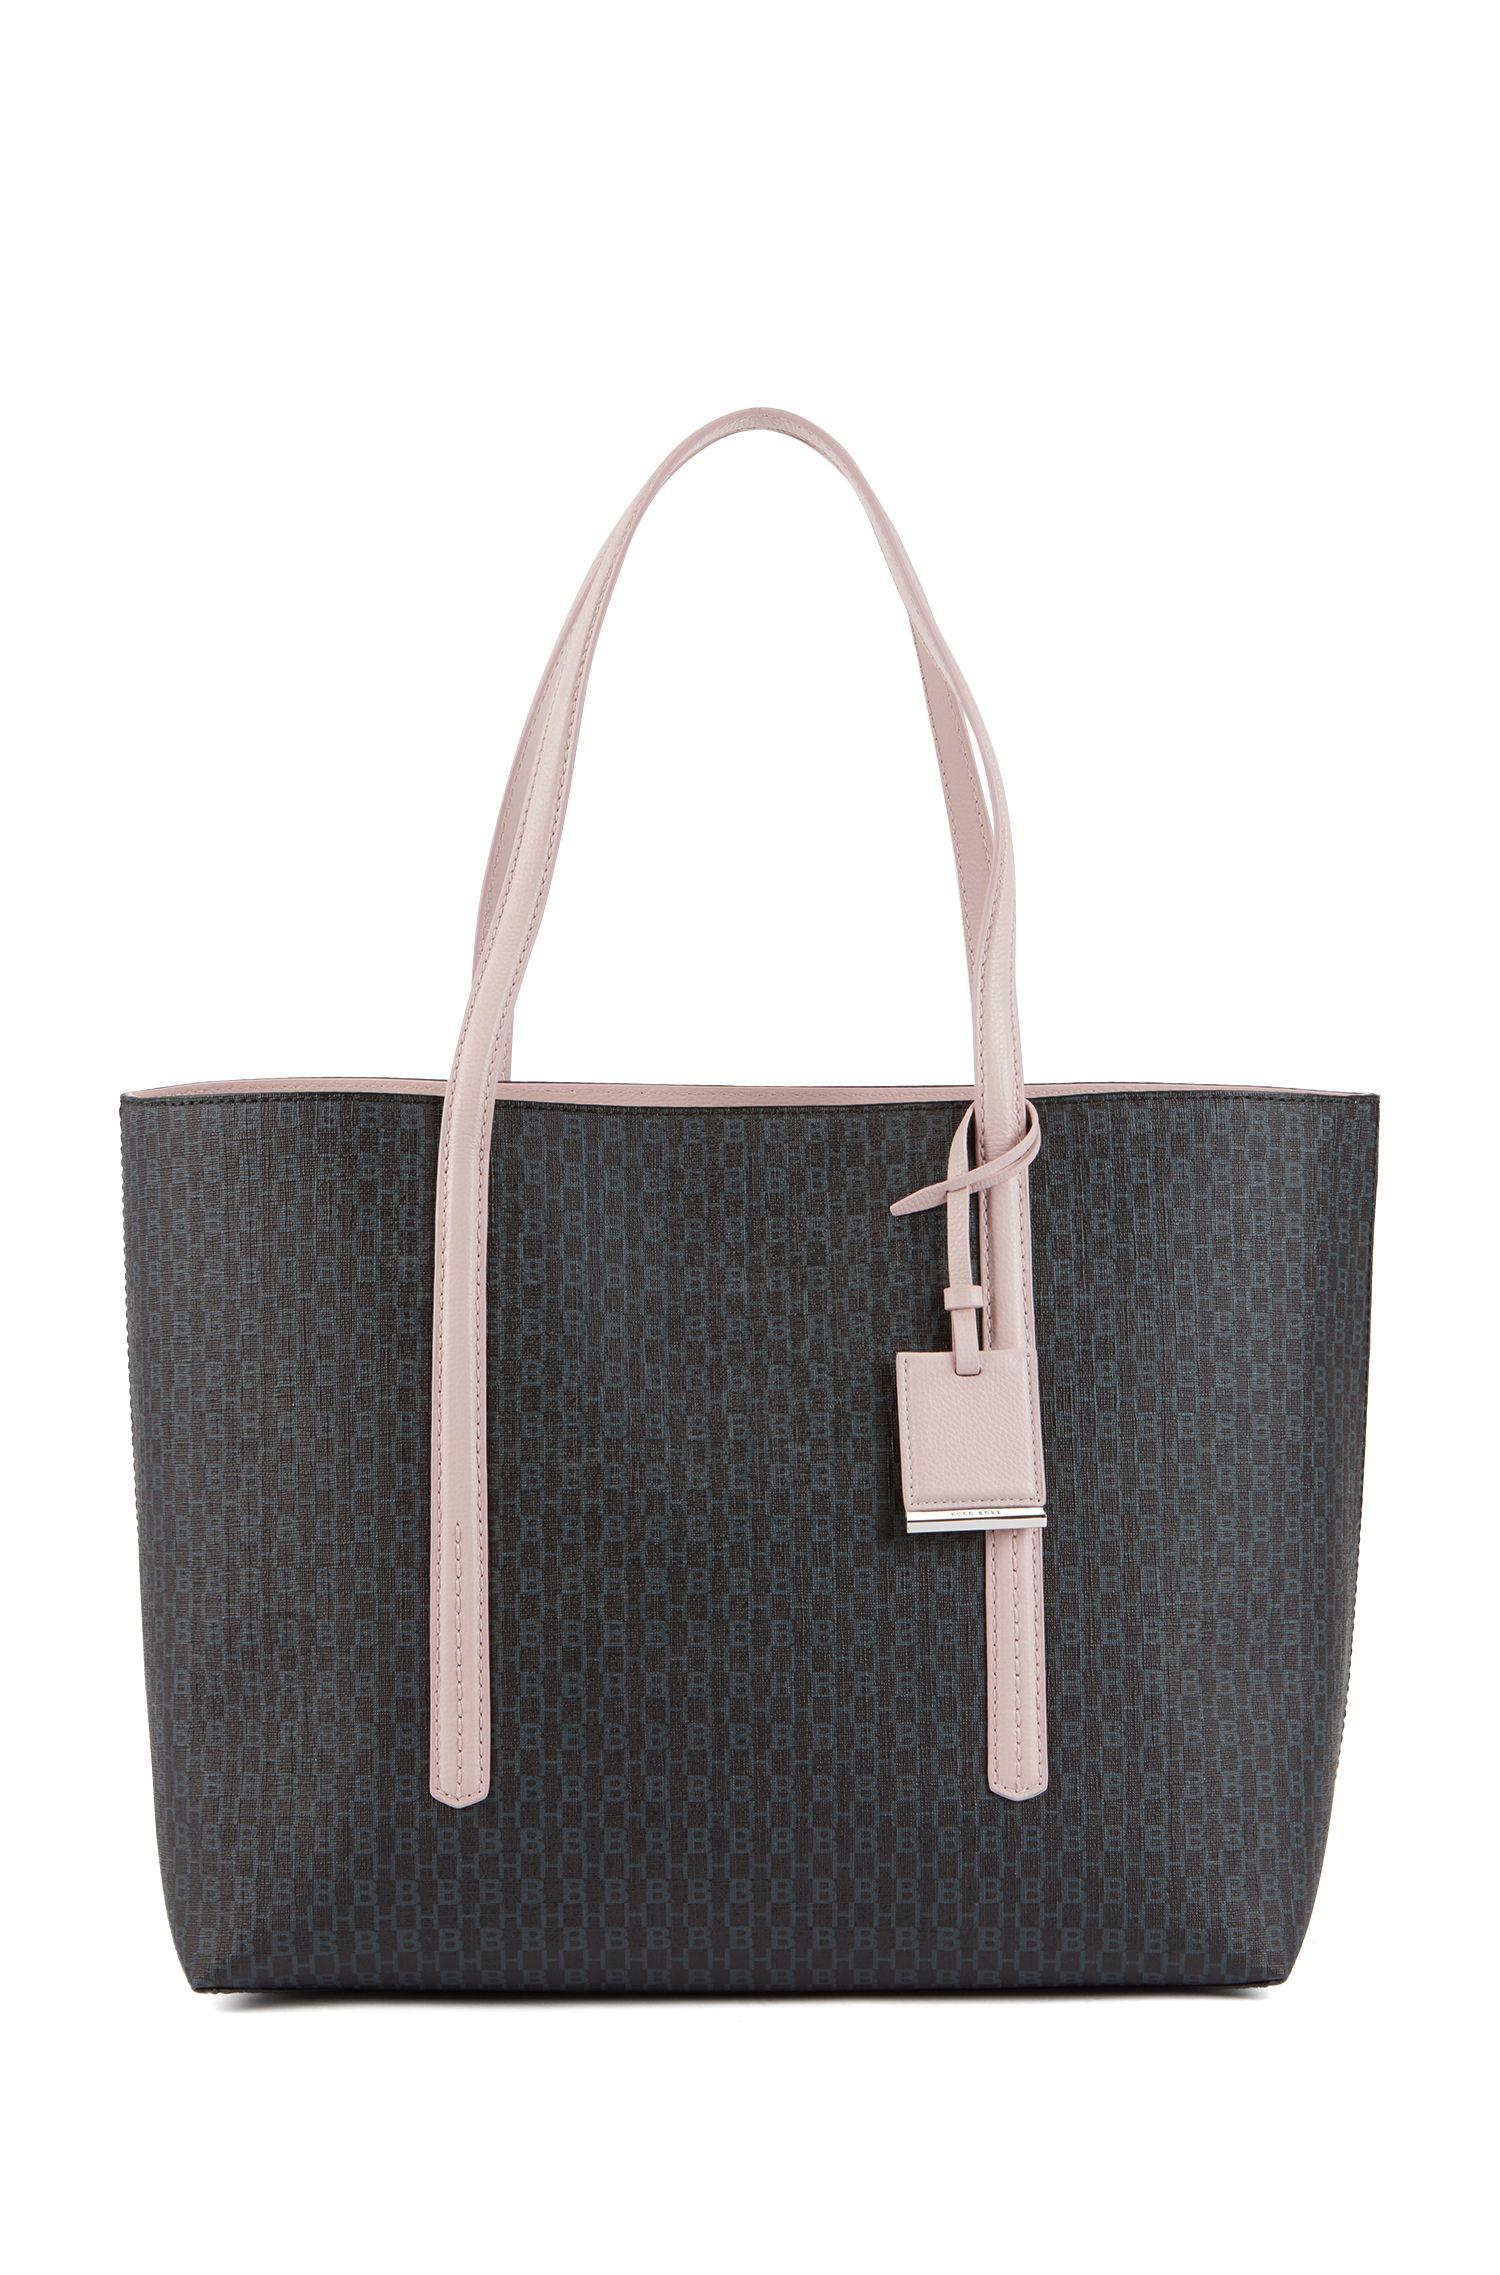 Shopper handbag in monogram-printed fabric, Black